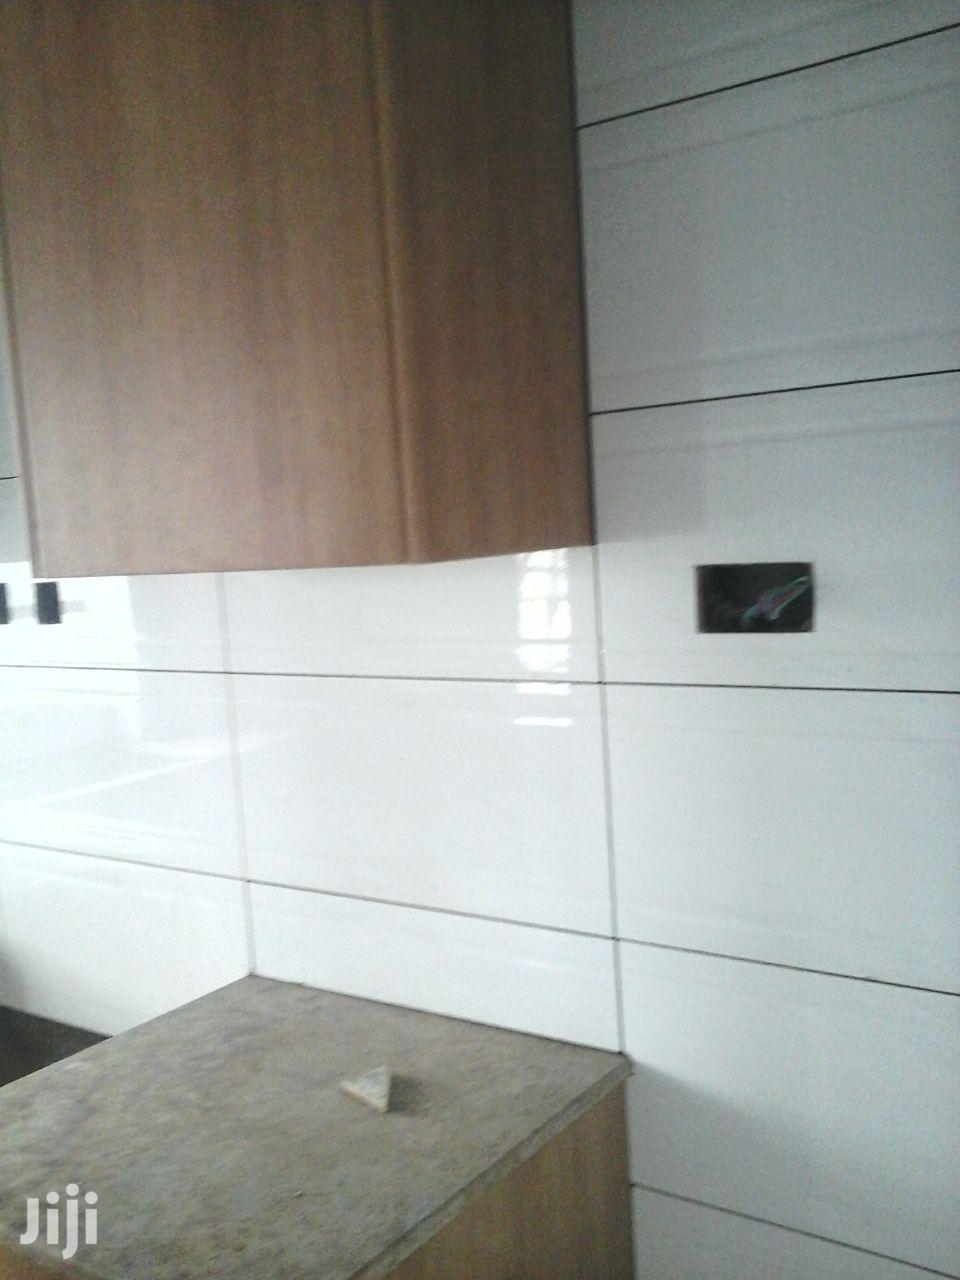 Tiles Fixing Expert | Building & Trades Services for sale in Runda, Nairobi, Kenya